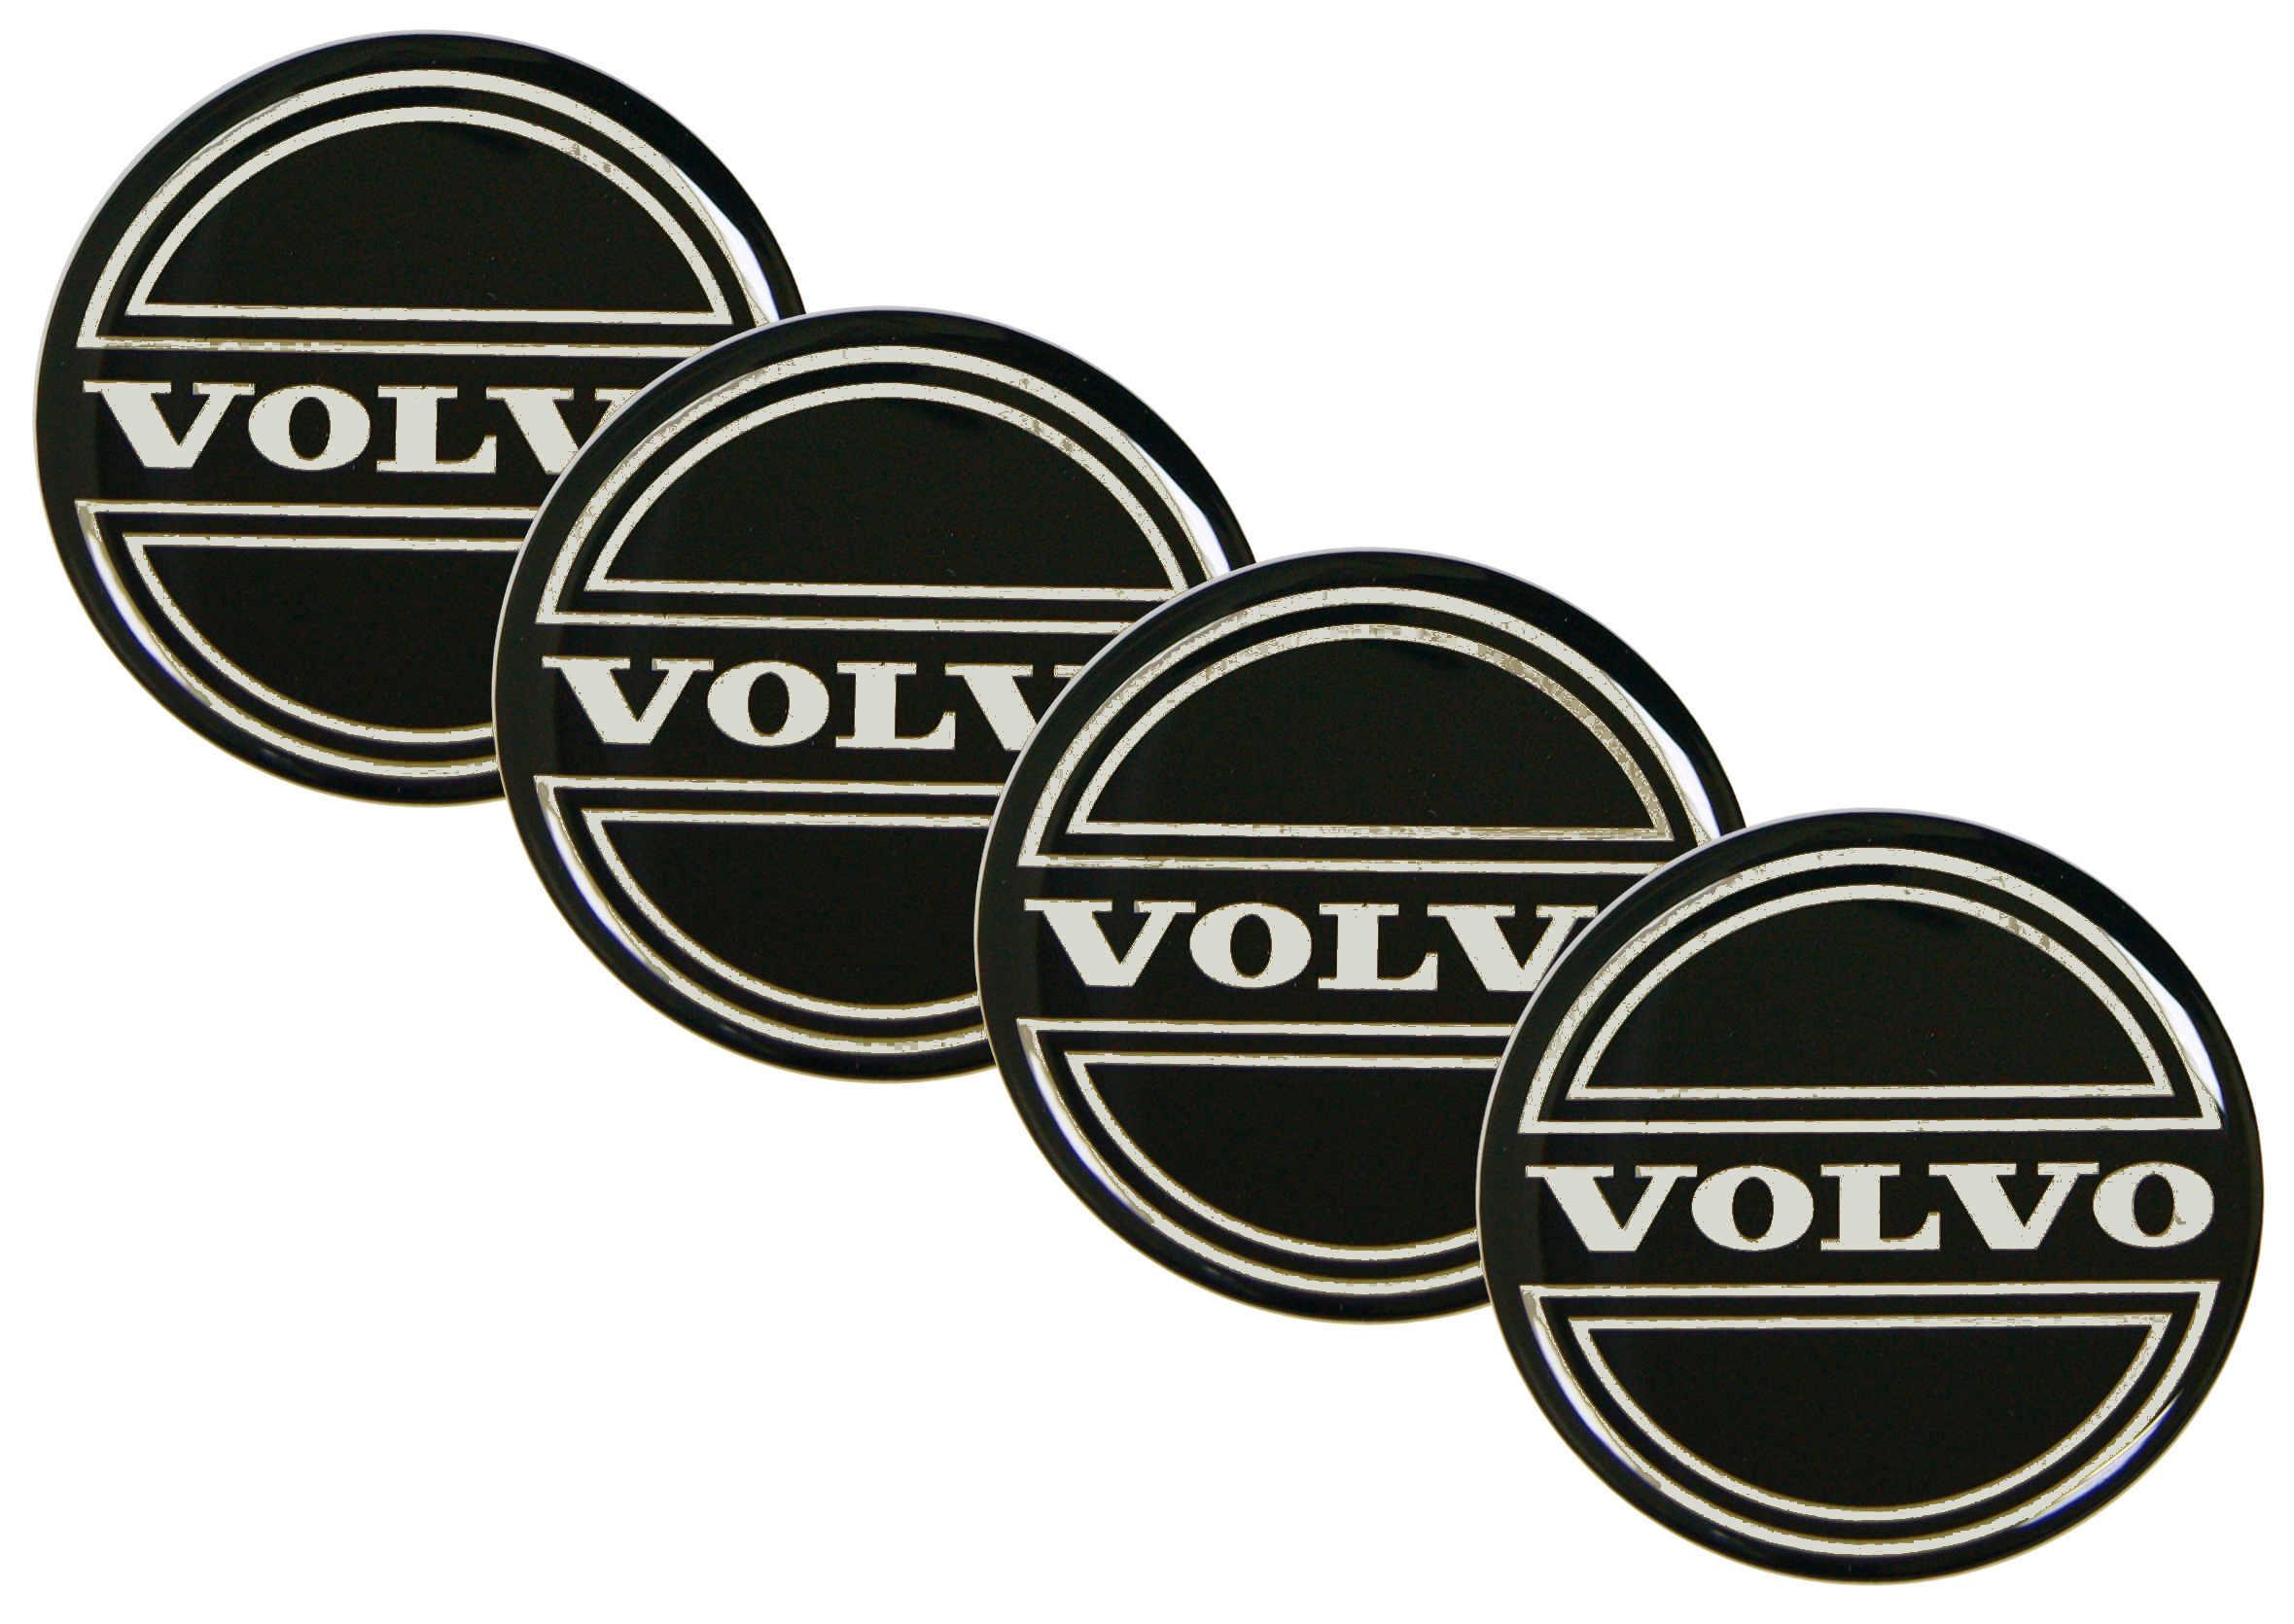 Naklejki wypukłe Emblematy Volvo 70 mm 4szt